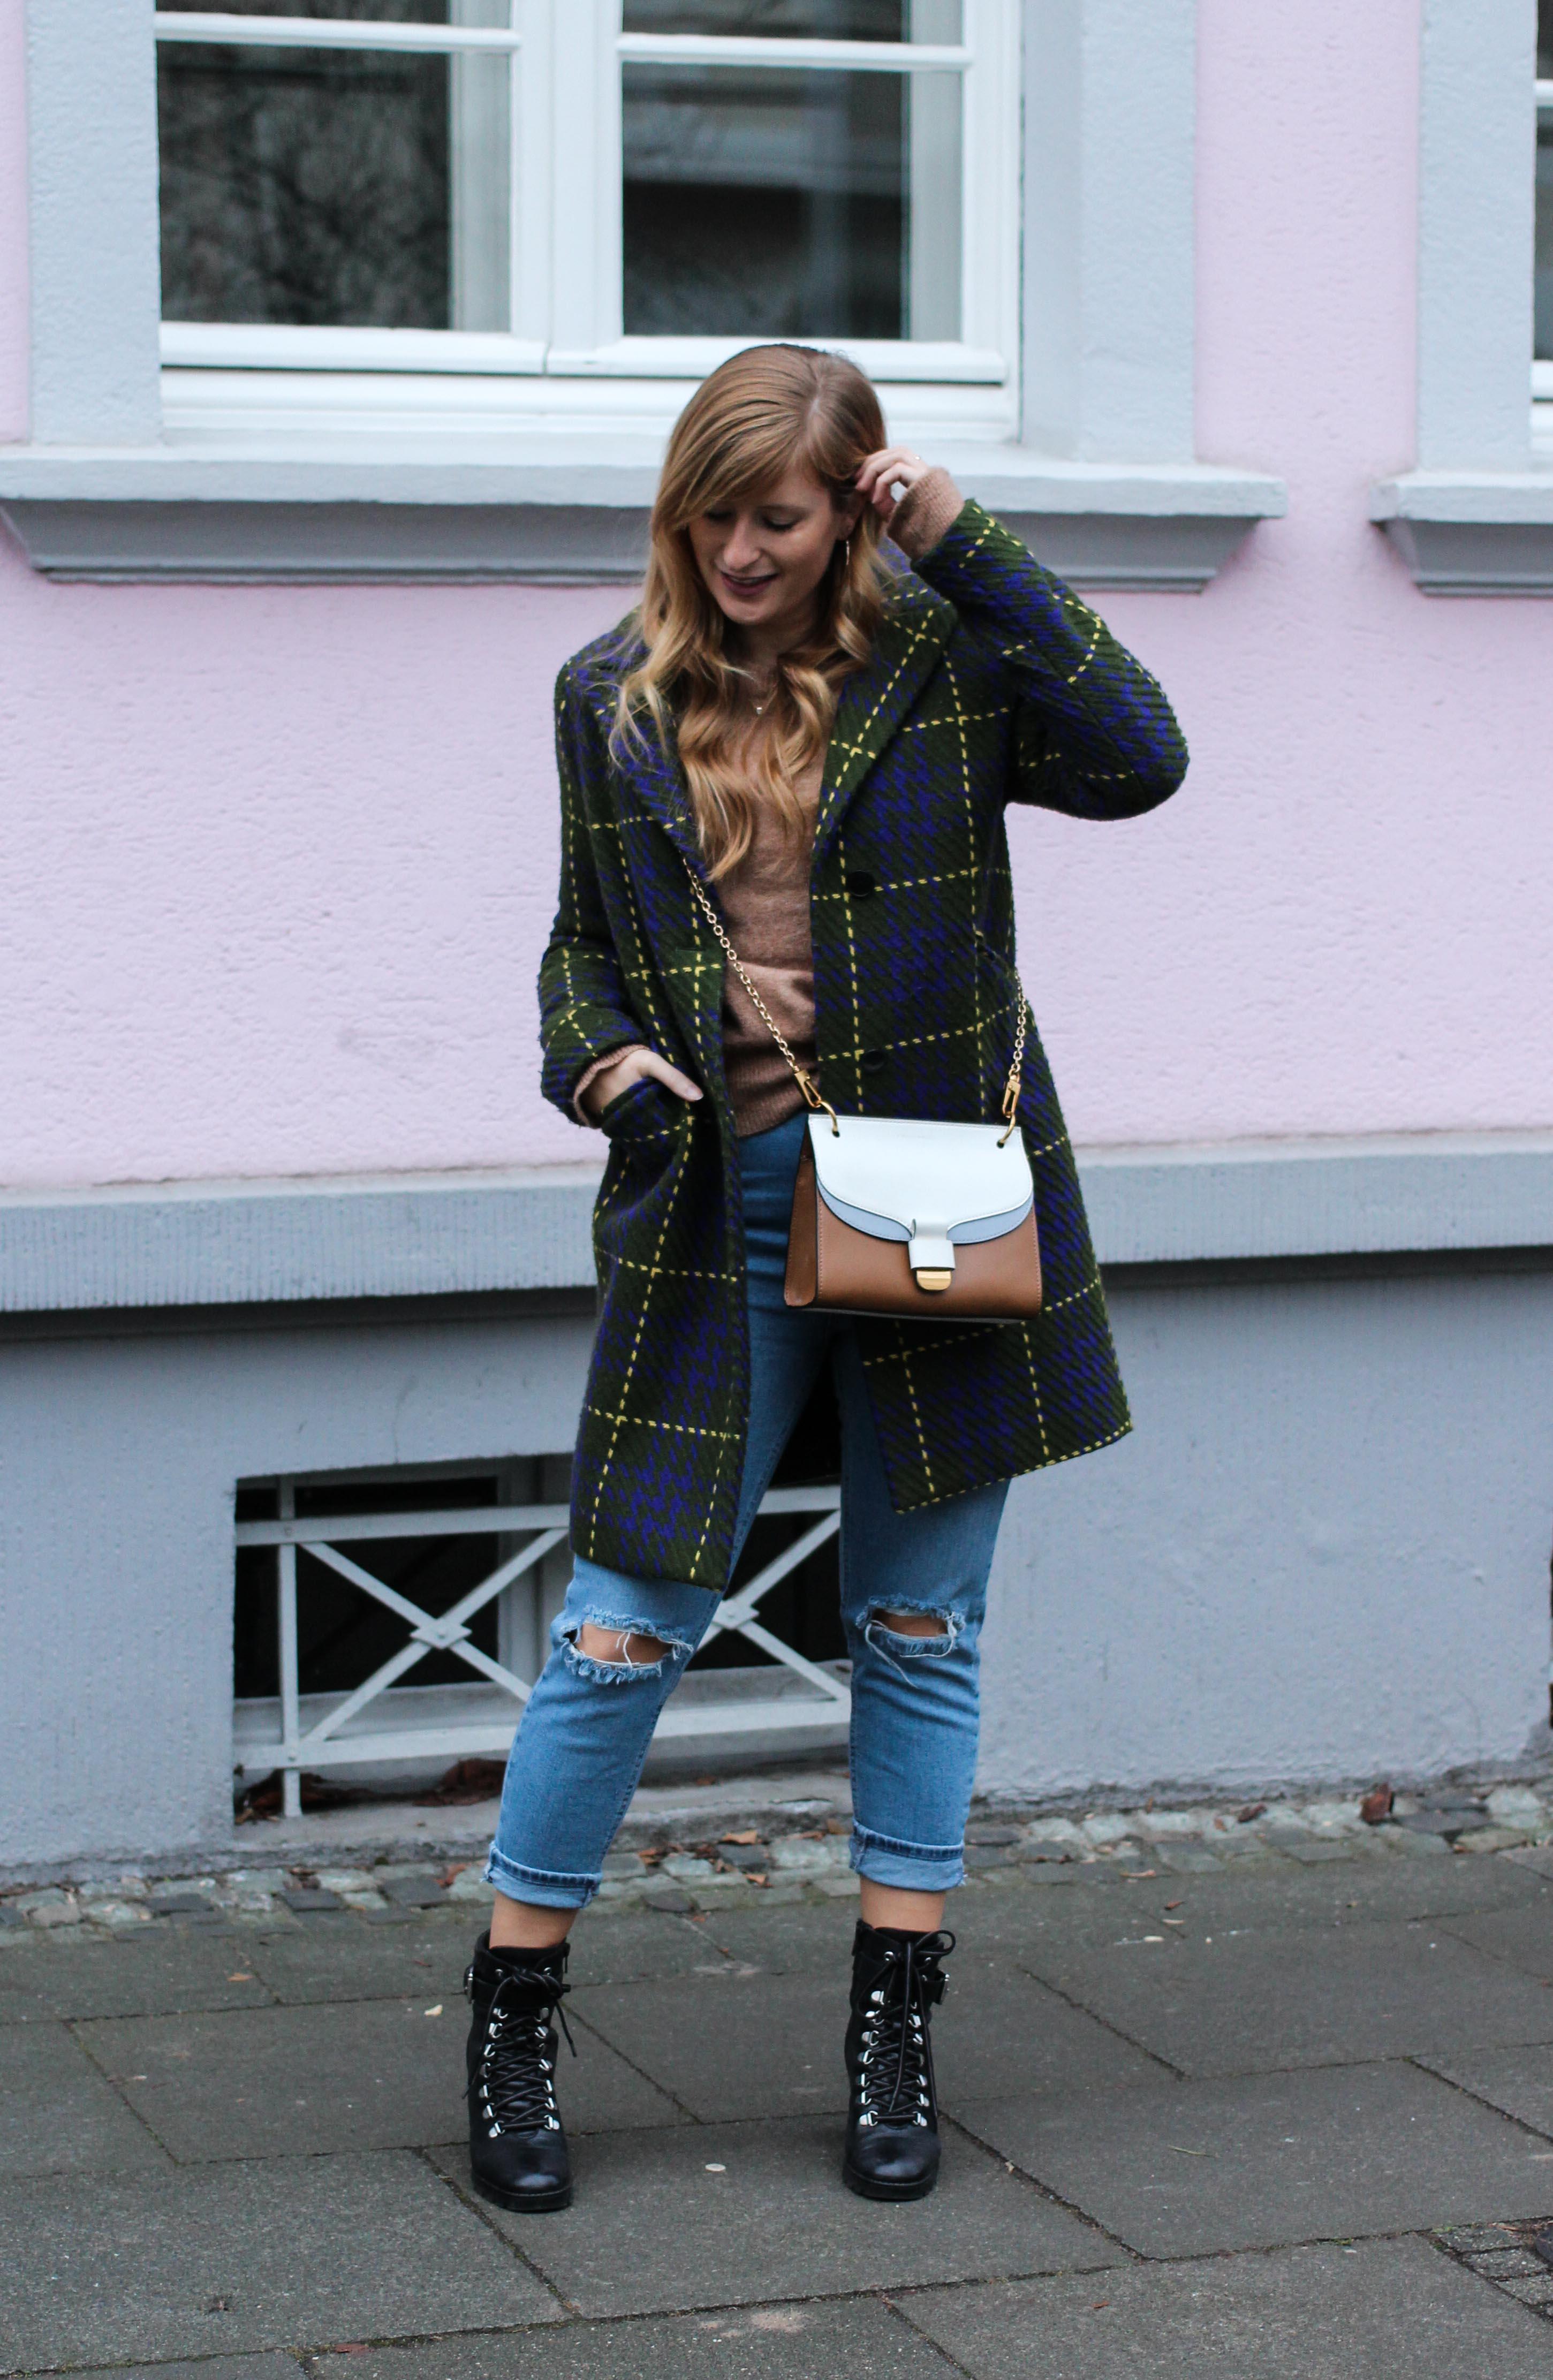 Herbst Must-Have 2019 Karomantel. Herbstmode Herbsttrend Mantel karriert Modeblog Outfit Herbst Fashion Blog Bonn 5